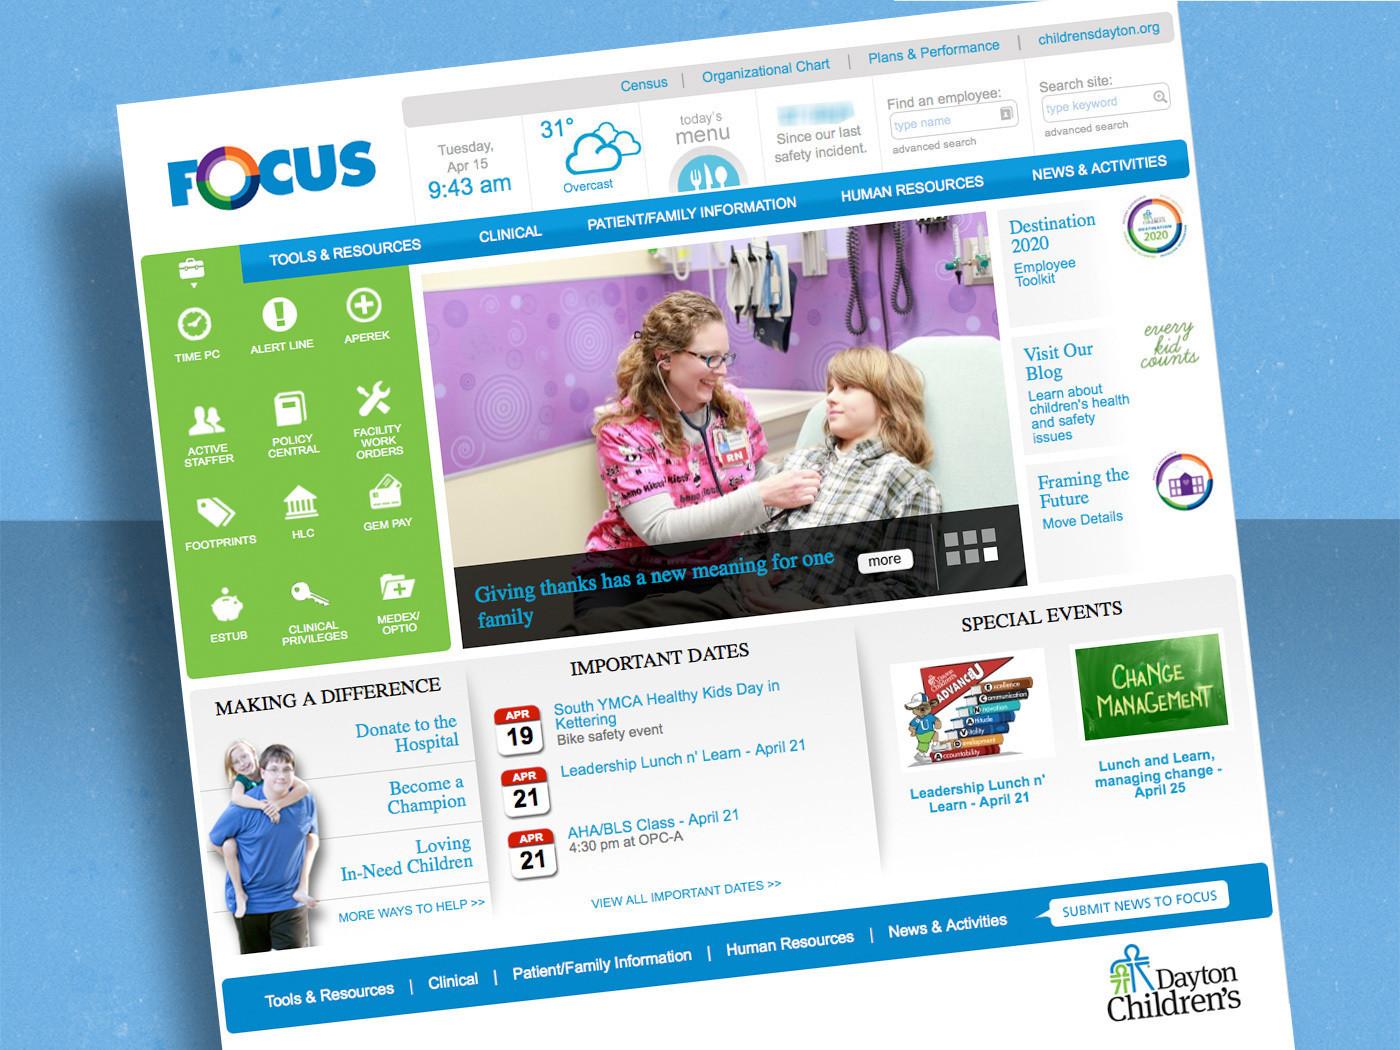 Dayton Children's Hospital Intranet (FOCUS)